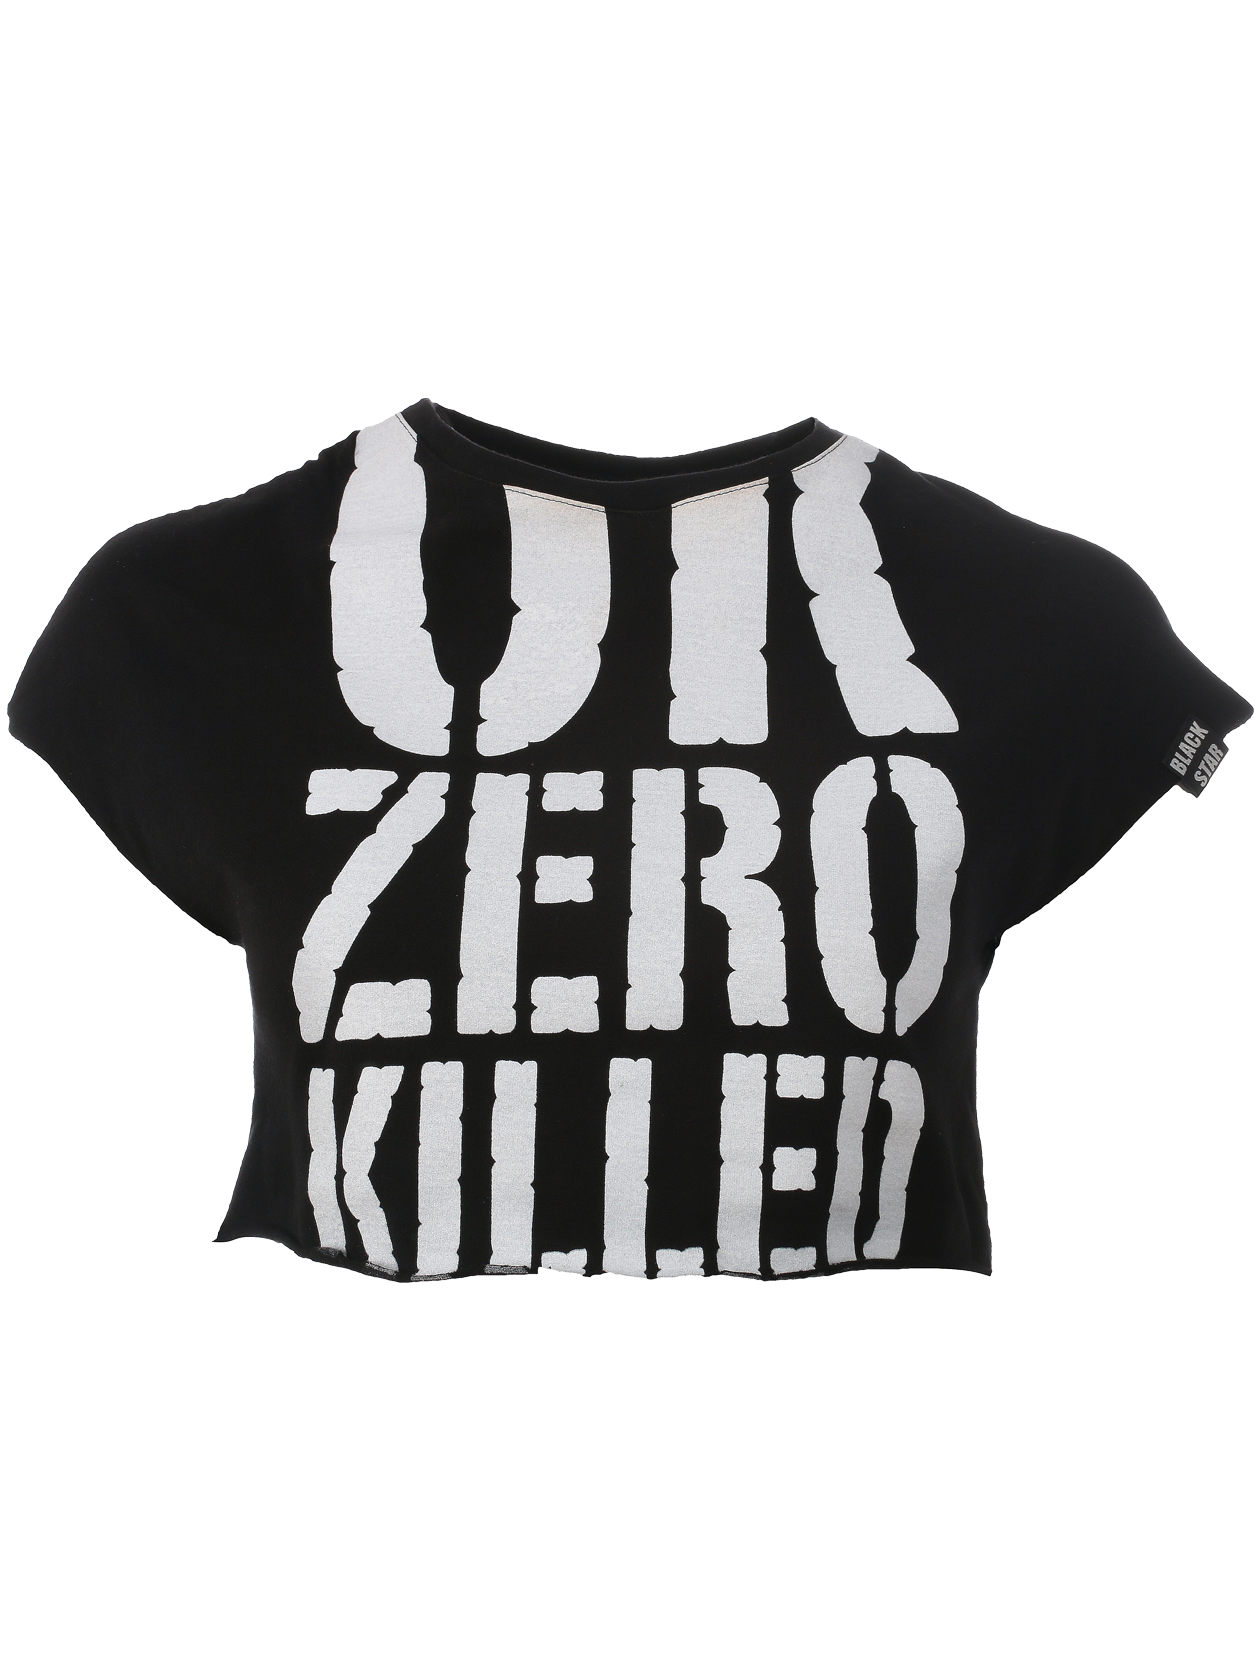 Womens top OK Zero Killed